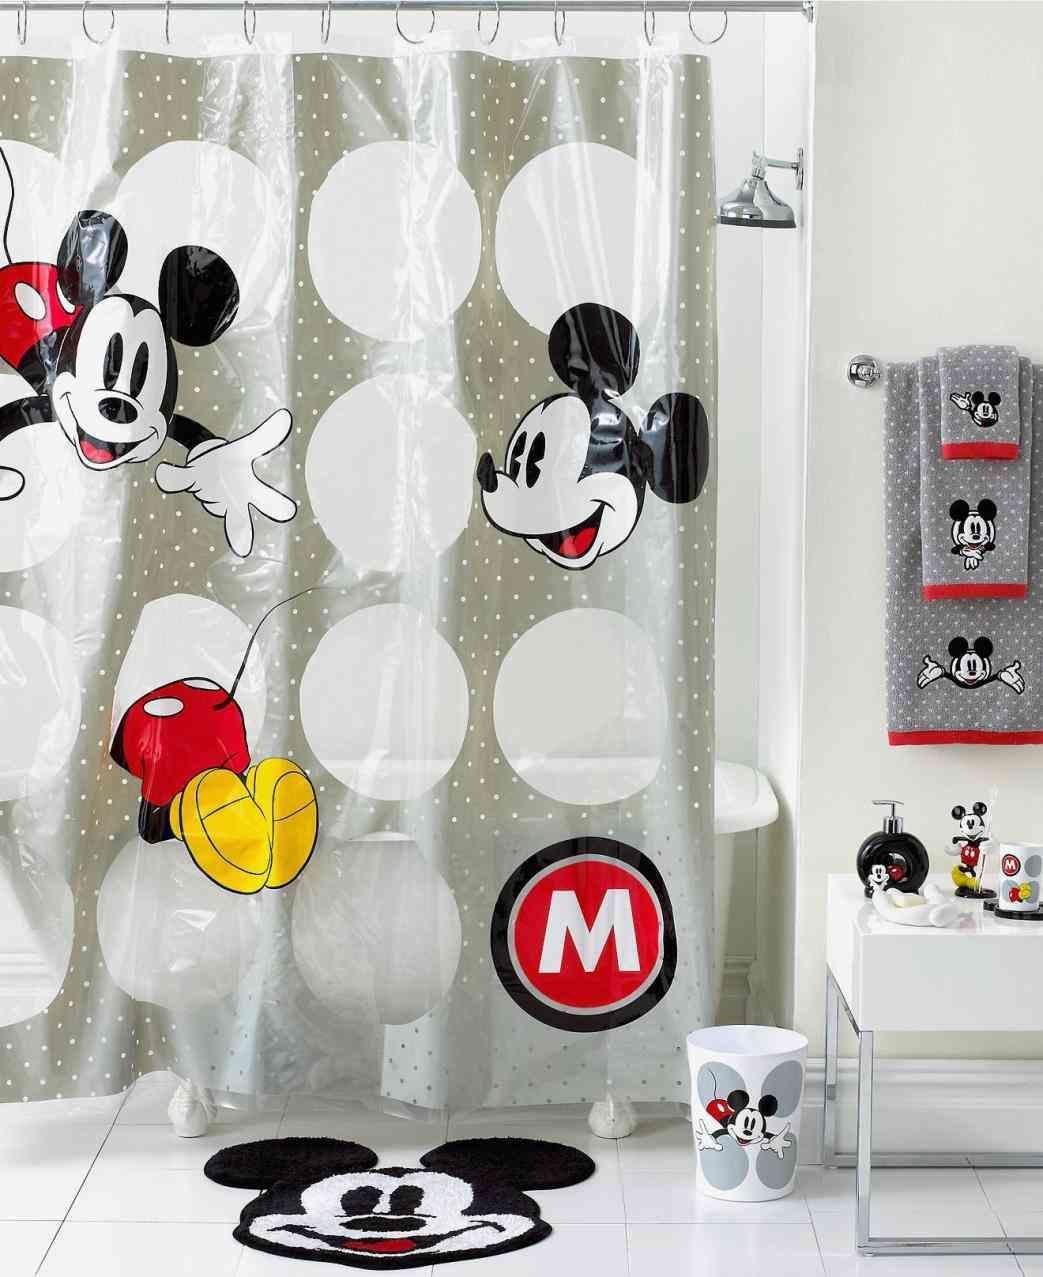 new post mickey minnie mouse bathroom decor bathroom ideas rh in pinterest com Minnie Mouse Room Decorating Ideas 2013 Minnie Winnie